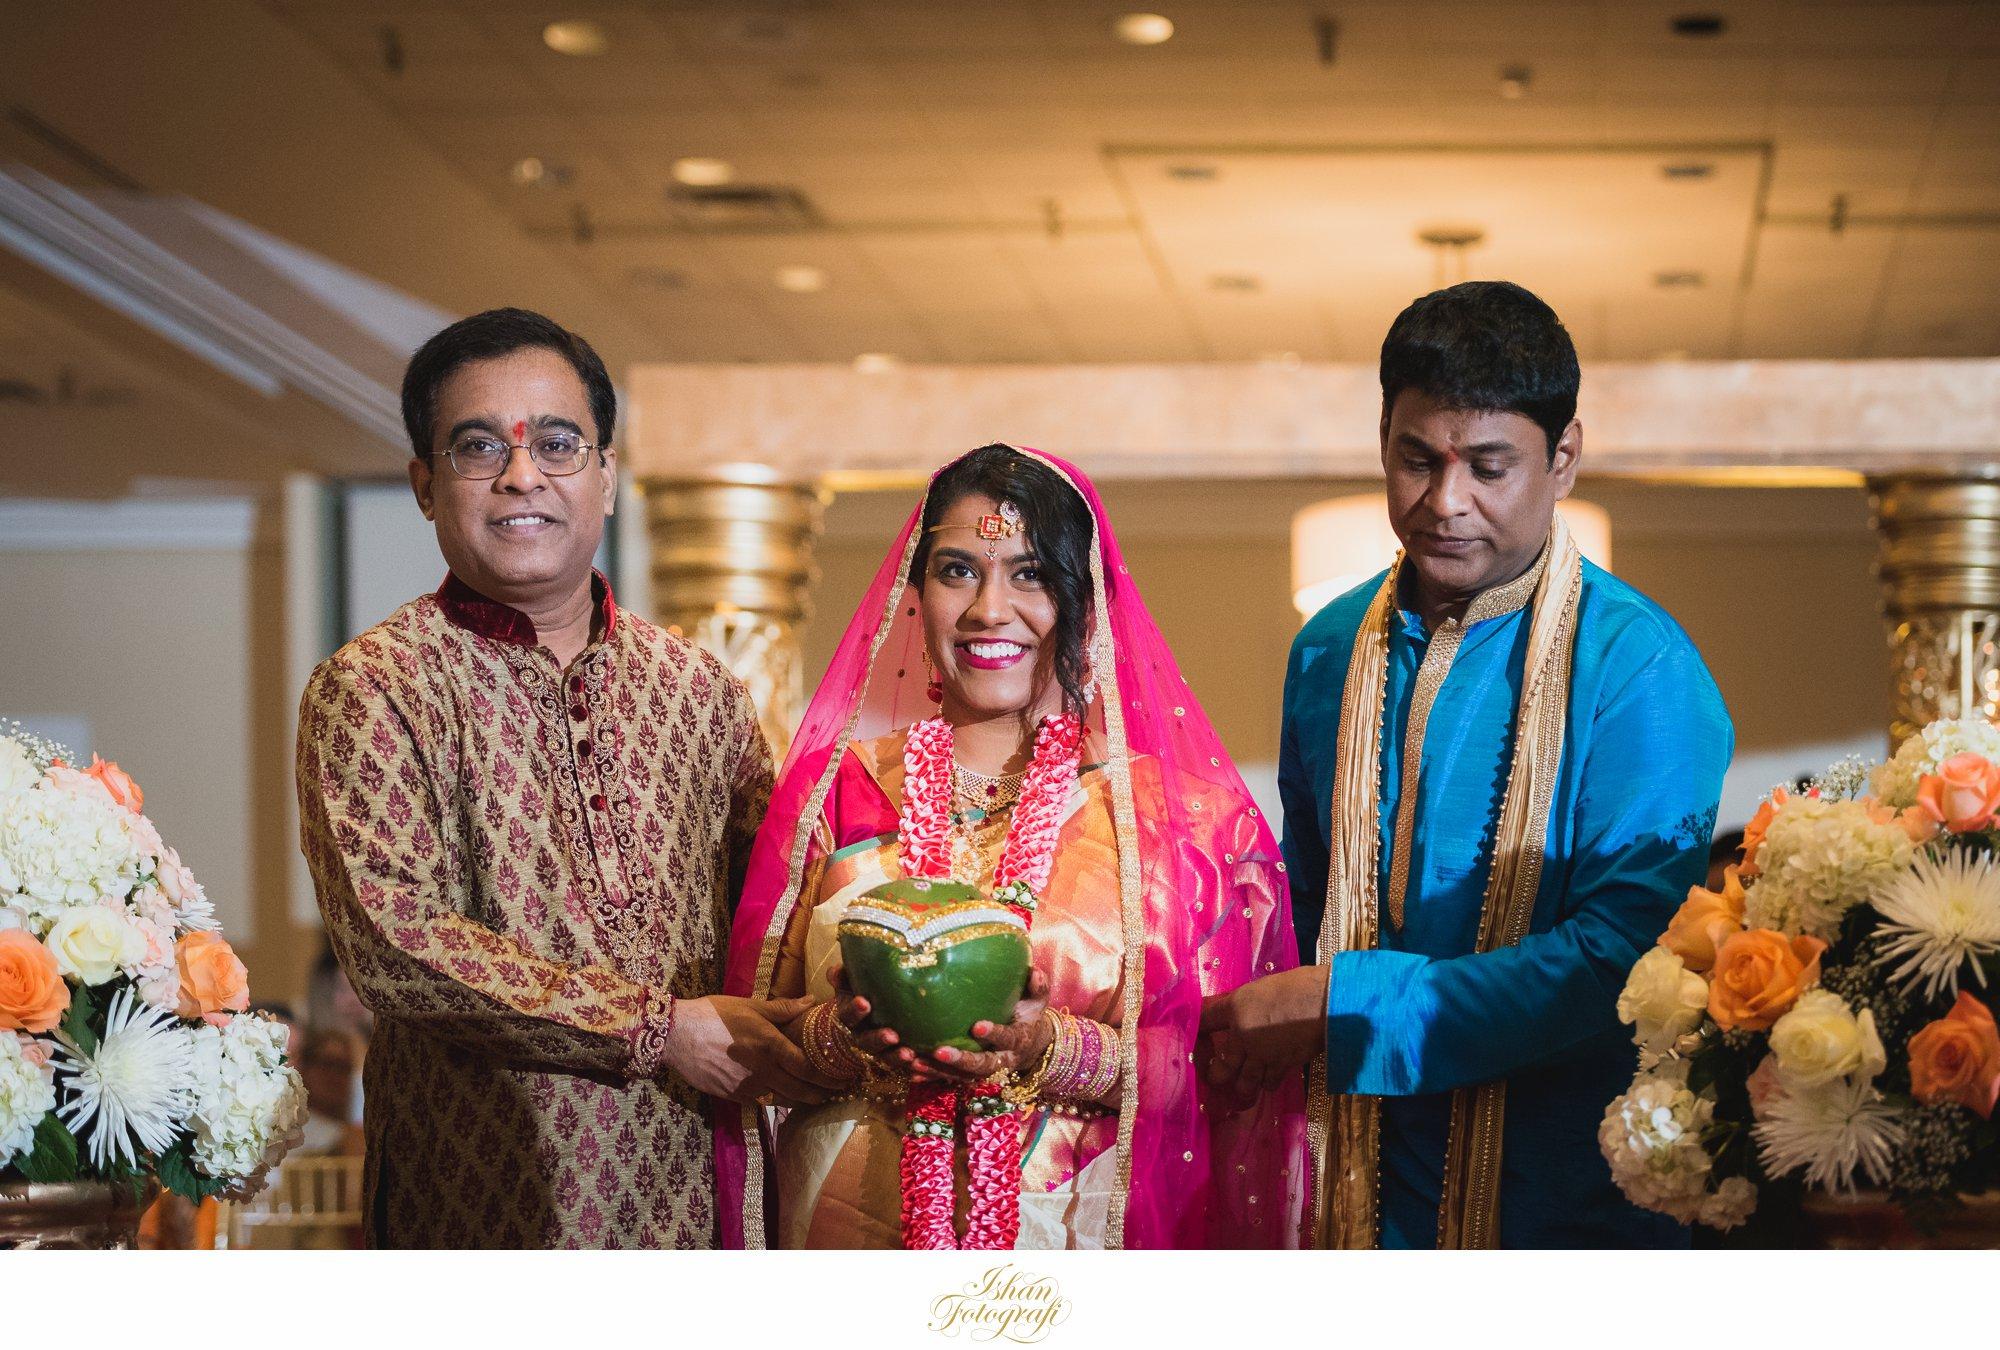 sheraton-harrisburg-hershey-hotel-indian-weddings